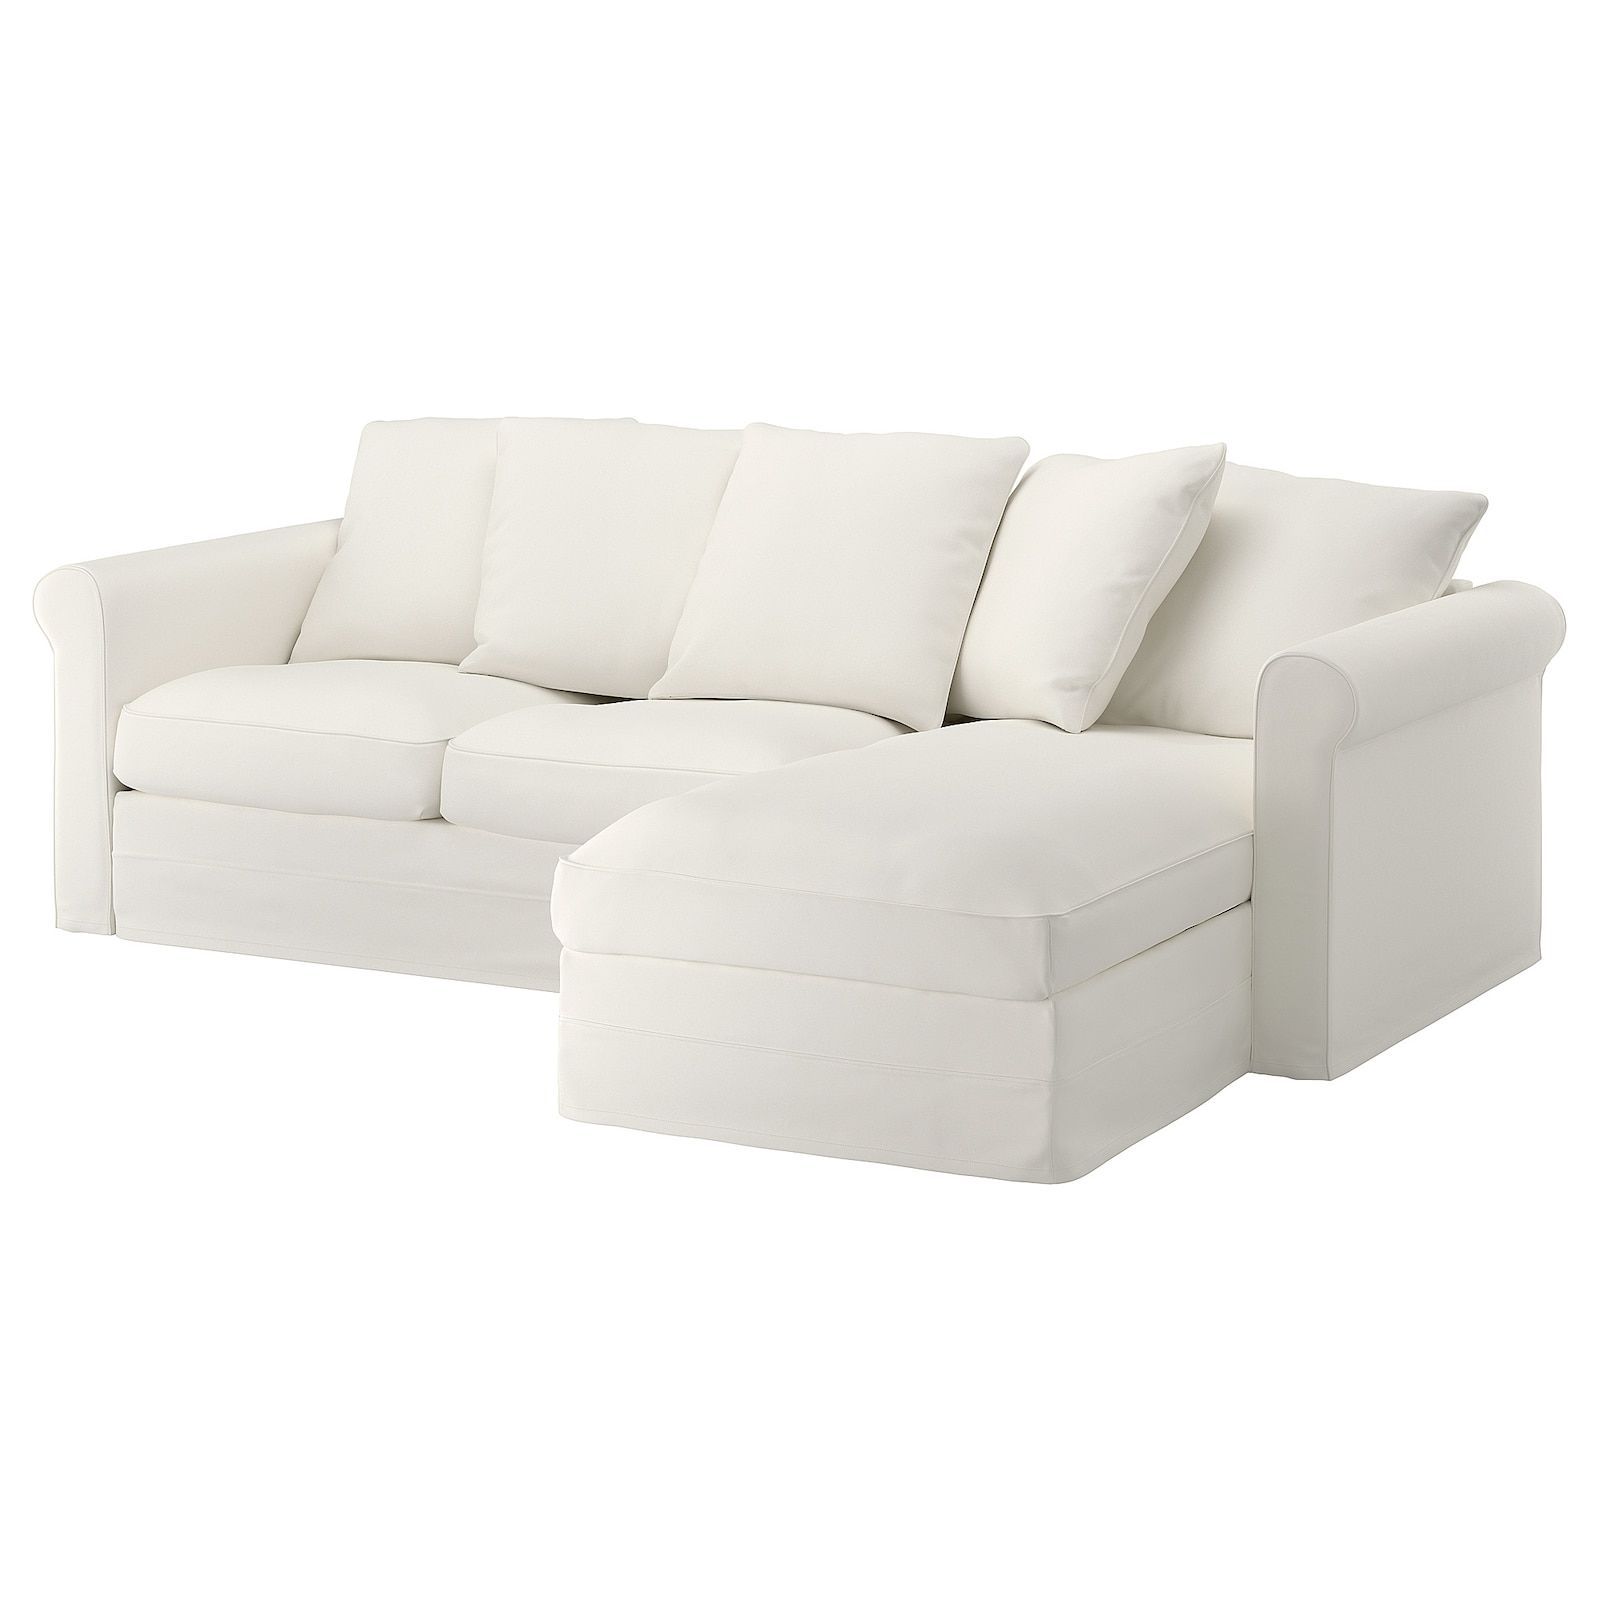 Harlanda Sofa With Chaise Inseros White Ikea In 2020 Fabric Sofa Sofa Sofa Armchair